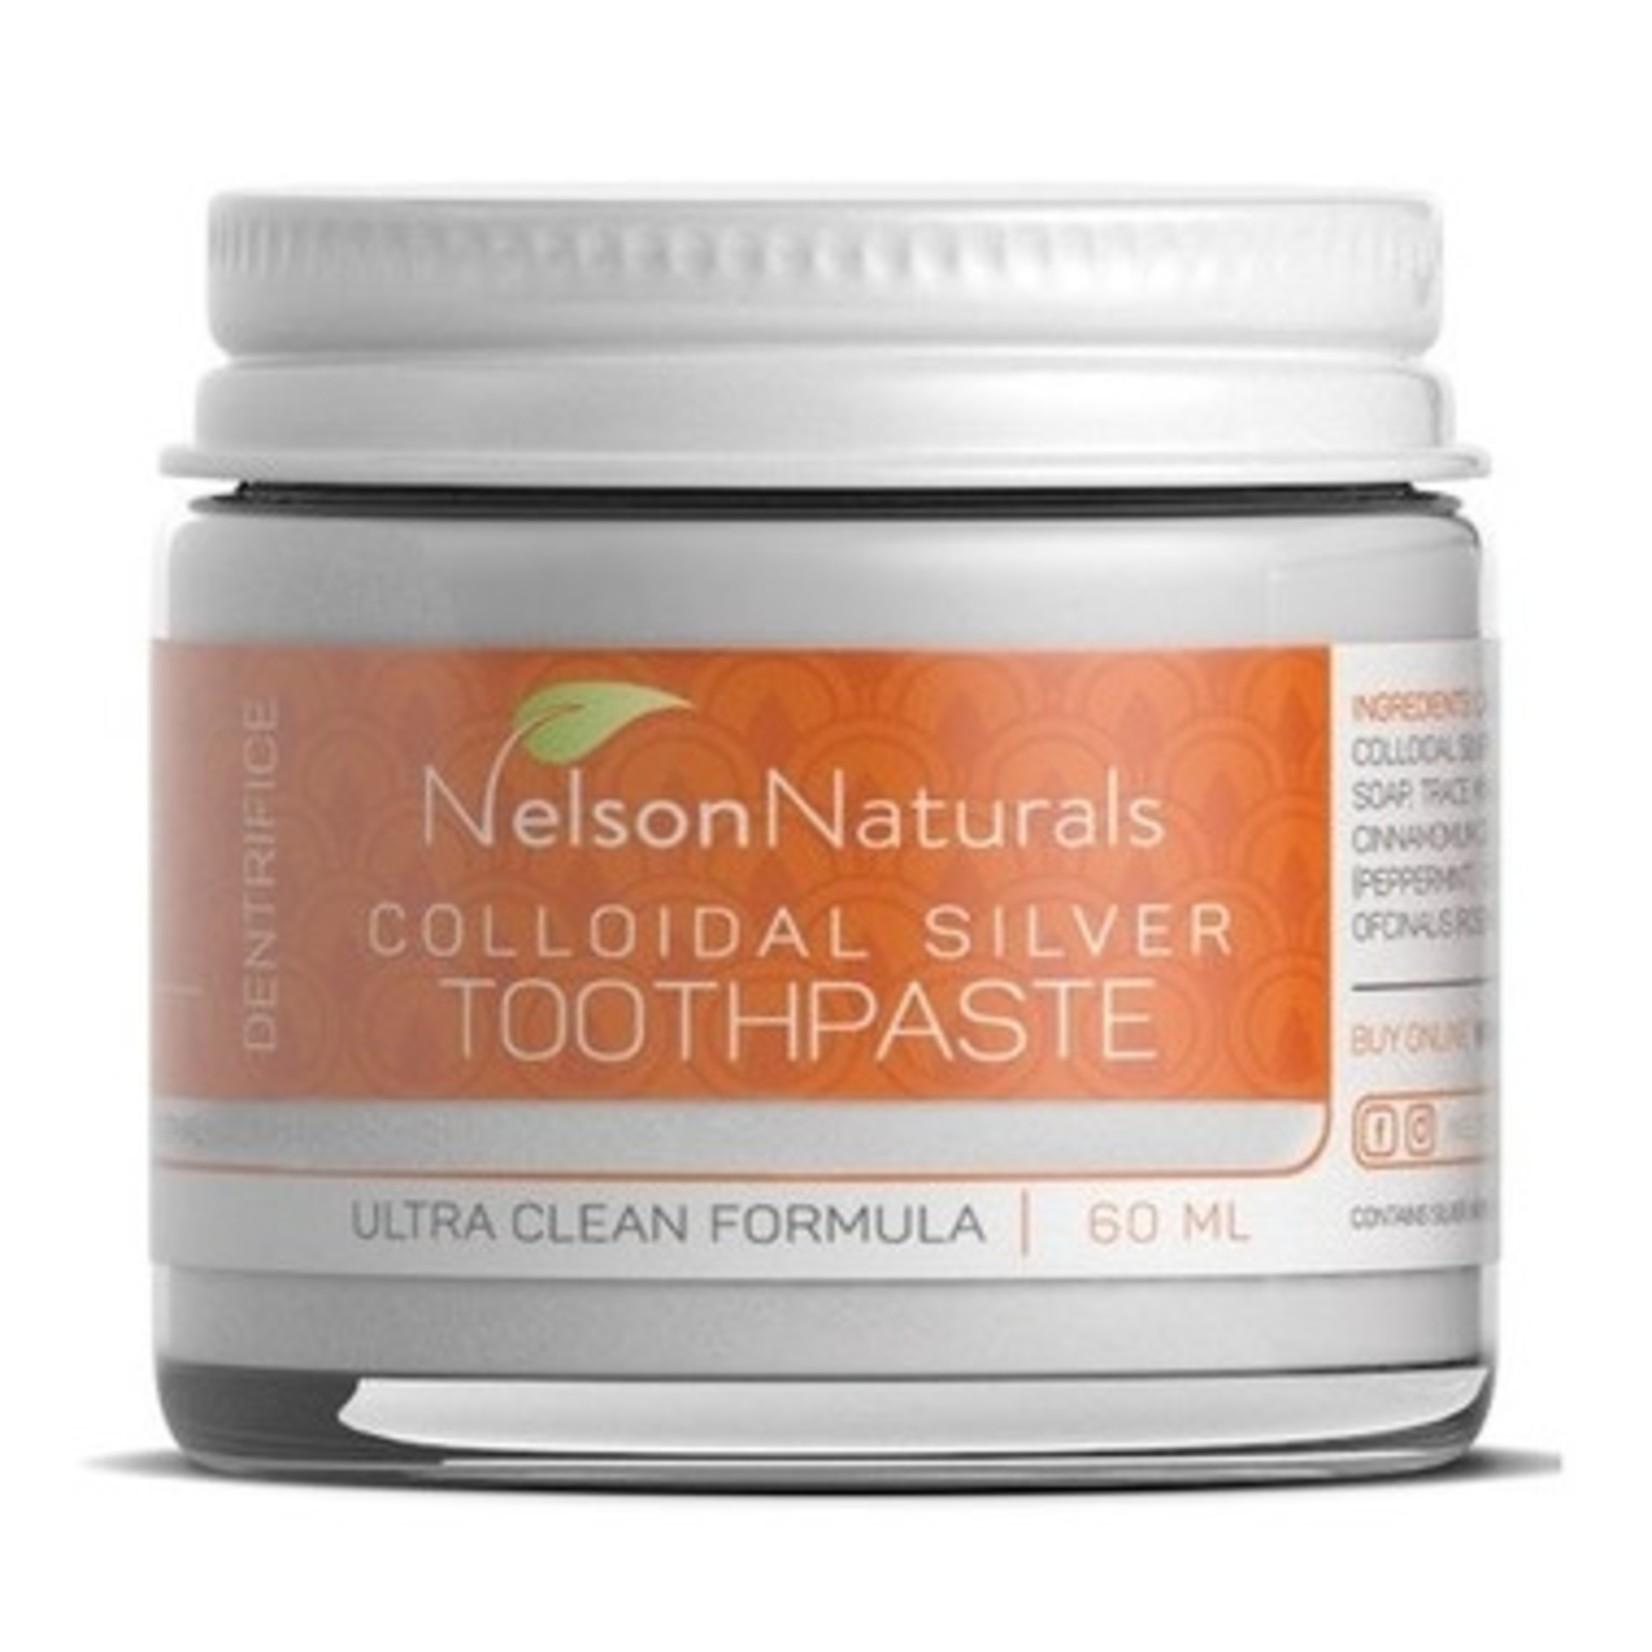 Nelson Naturals Toothpaste- Citrus Spice Blend 60ml